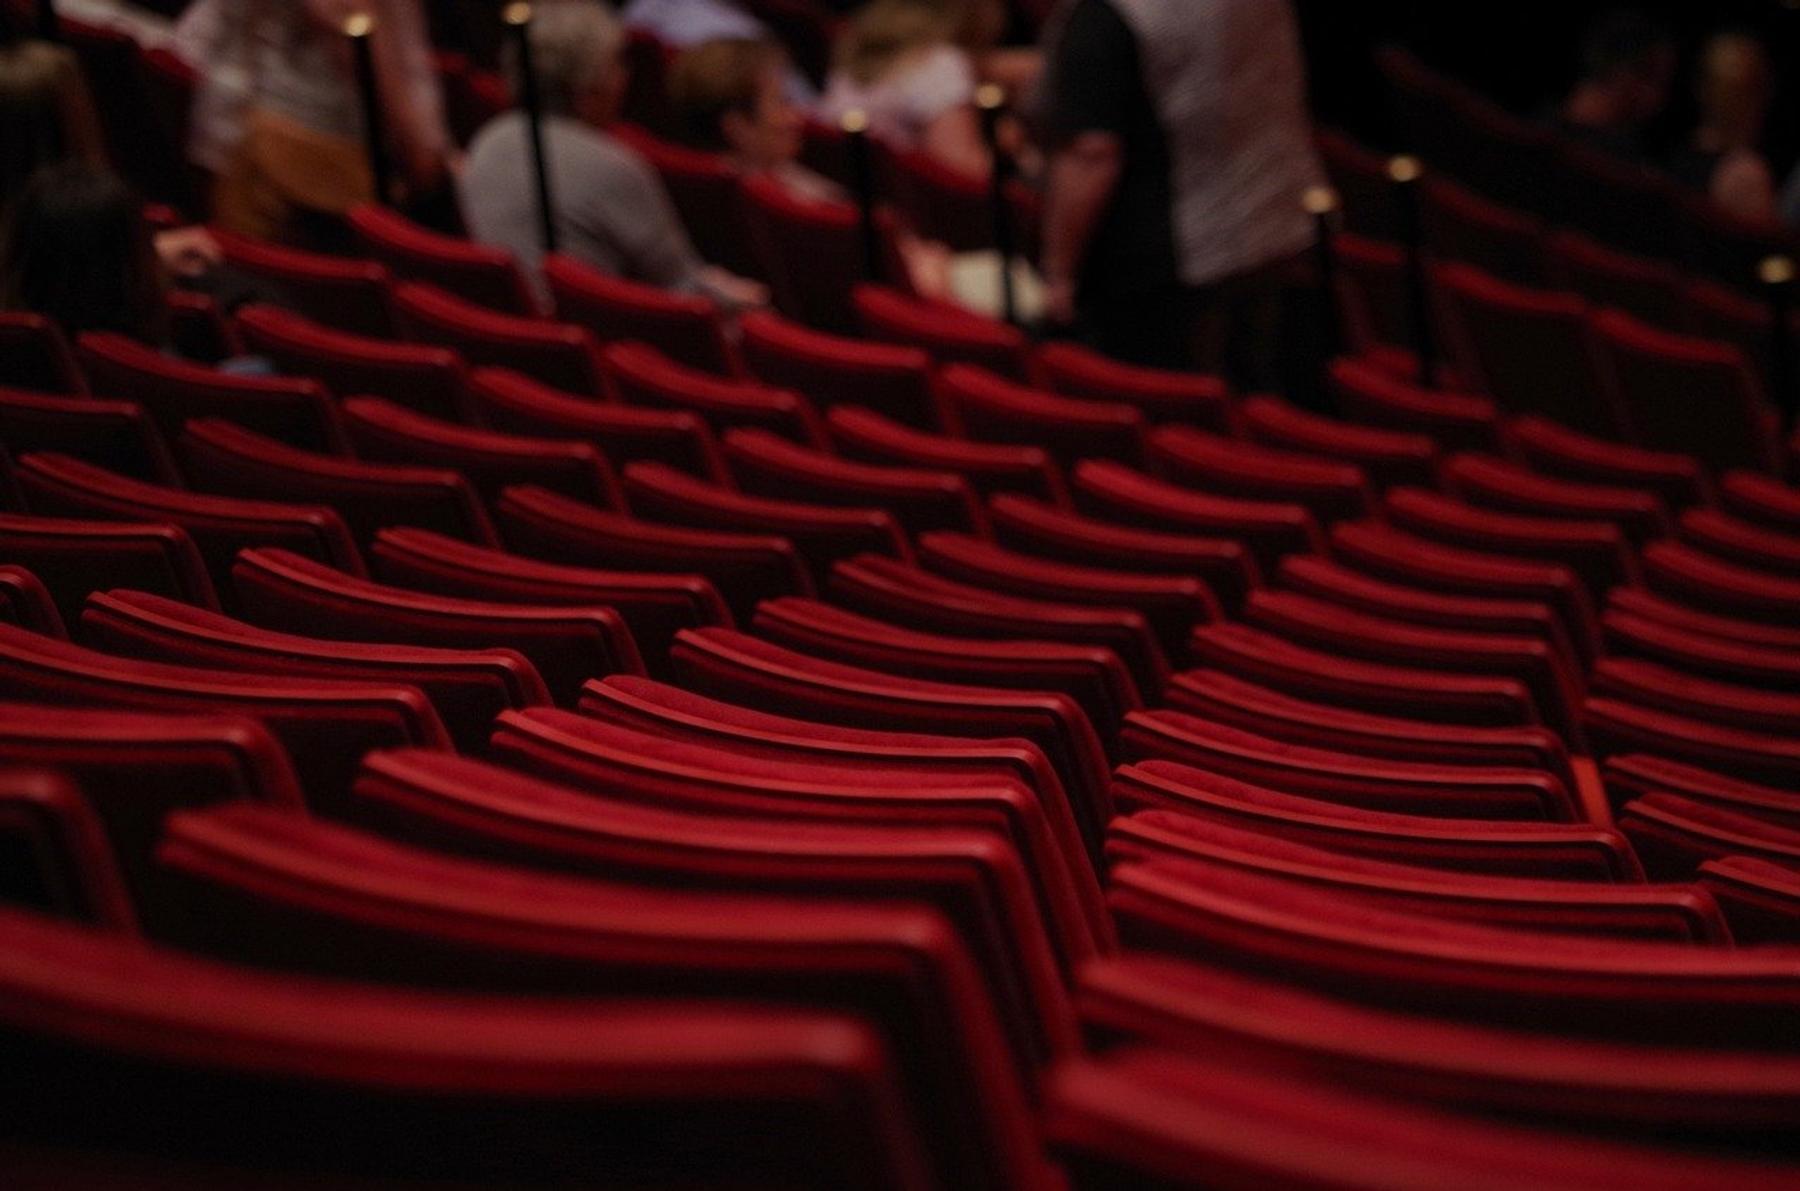 empty seats in a theatre